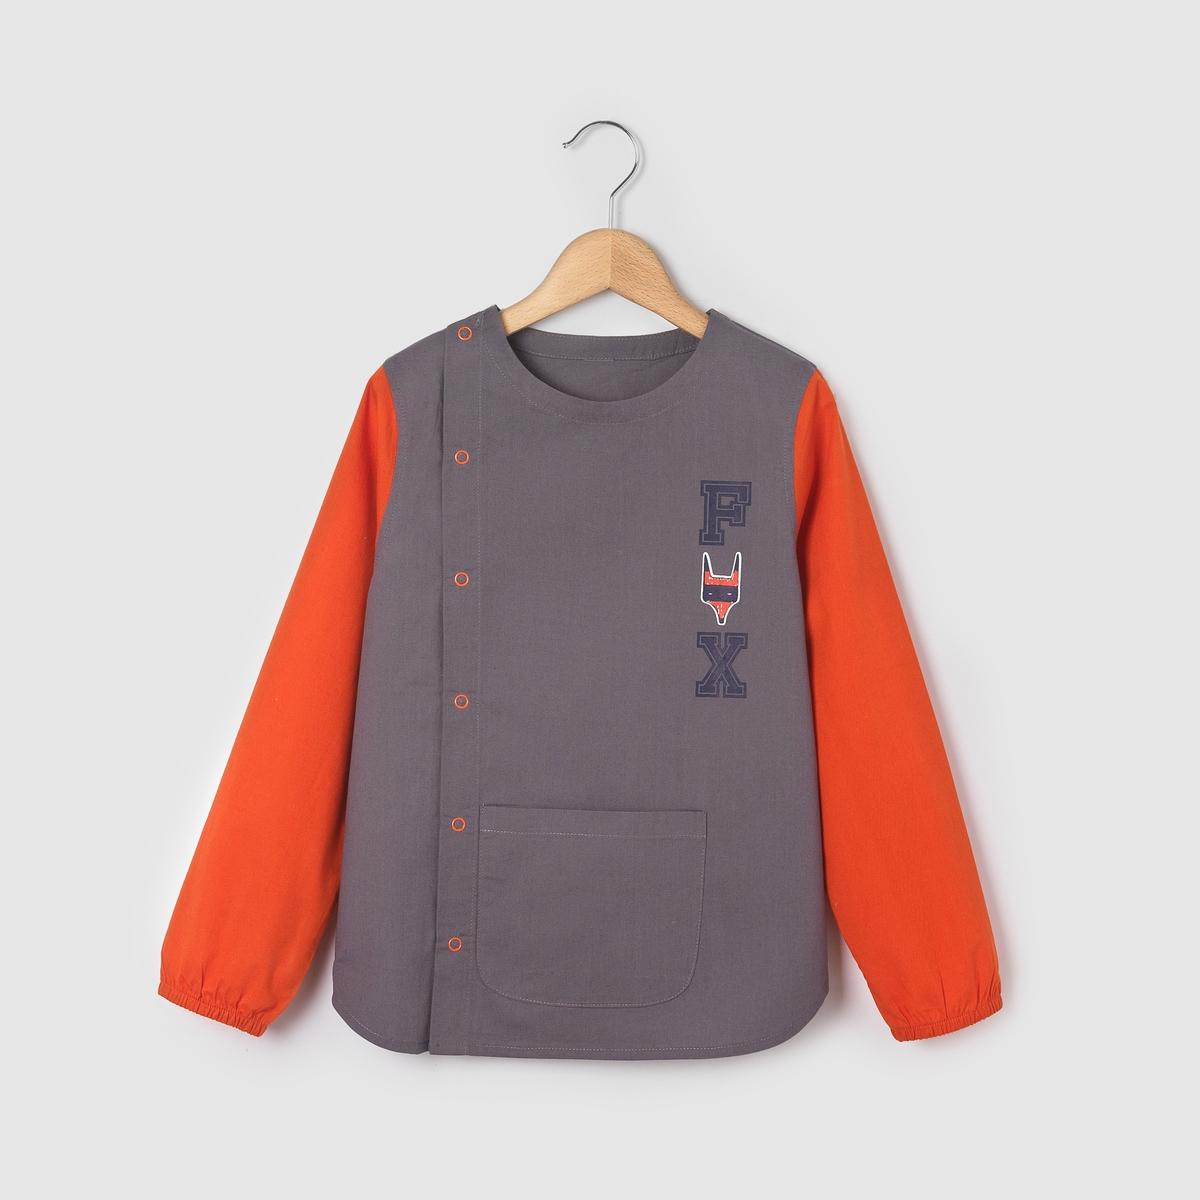 Блуза школьная с принтом лиса на 3-12 лет от La Redoute